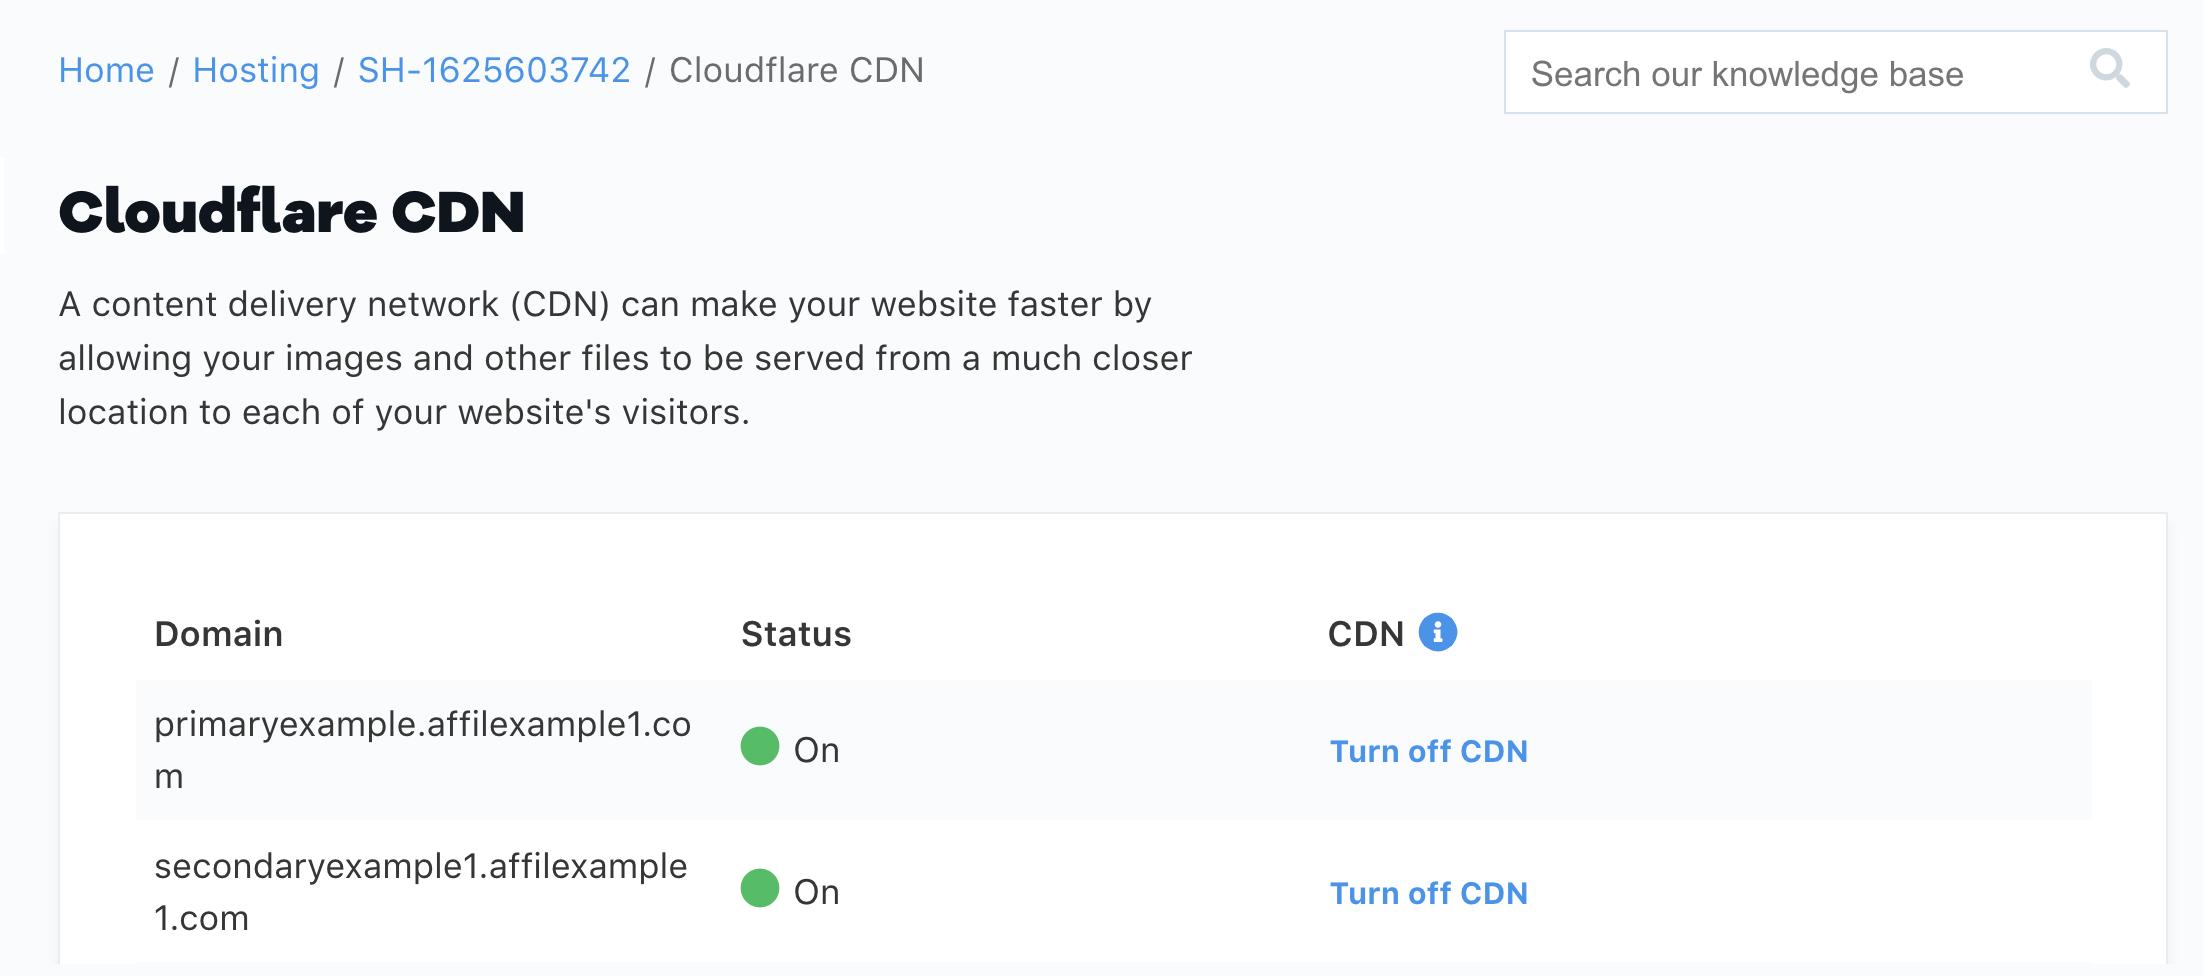 HostGator Cloudflare CDN On Status